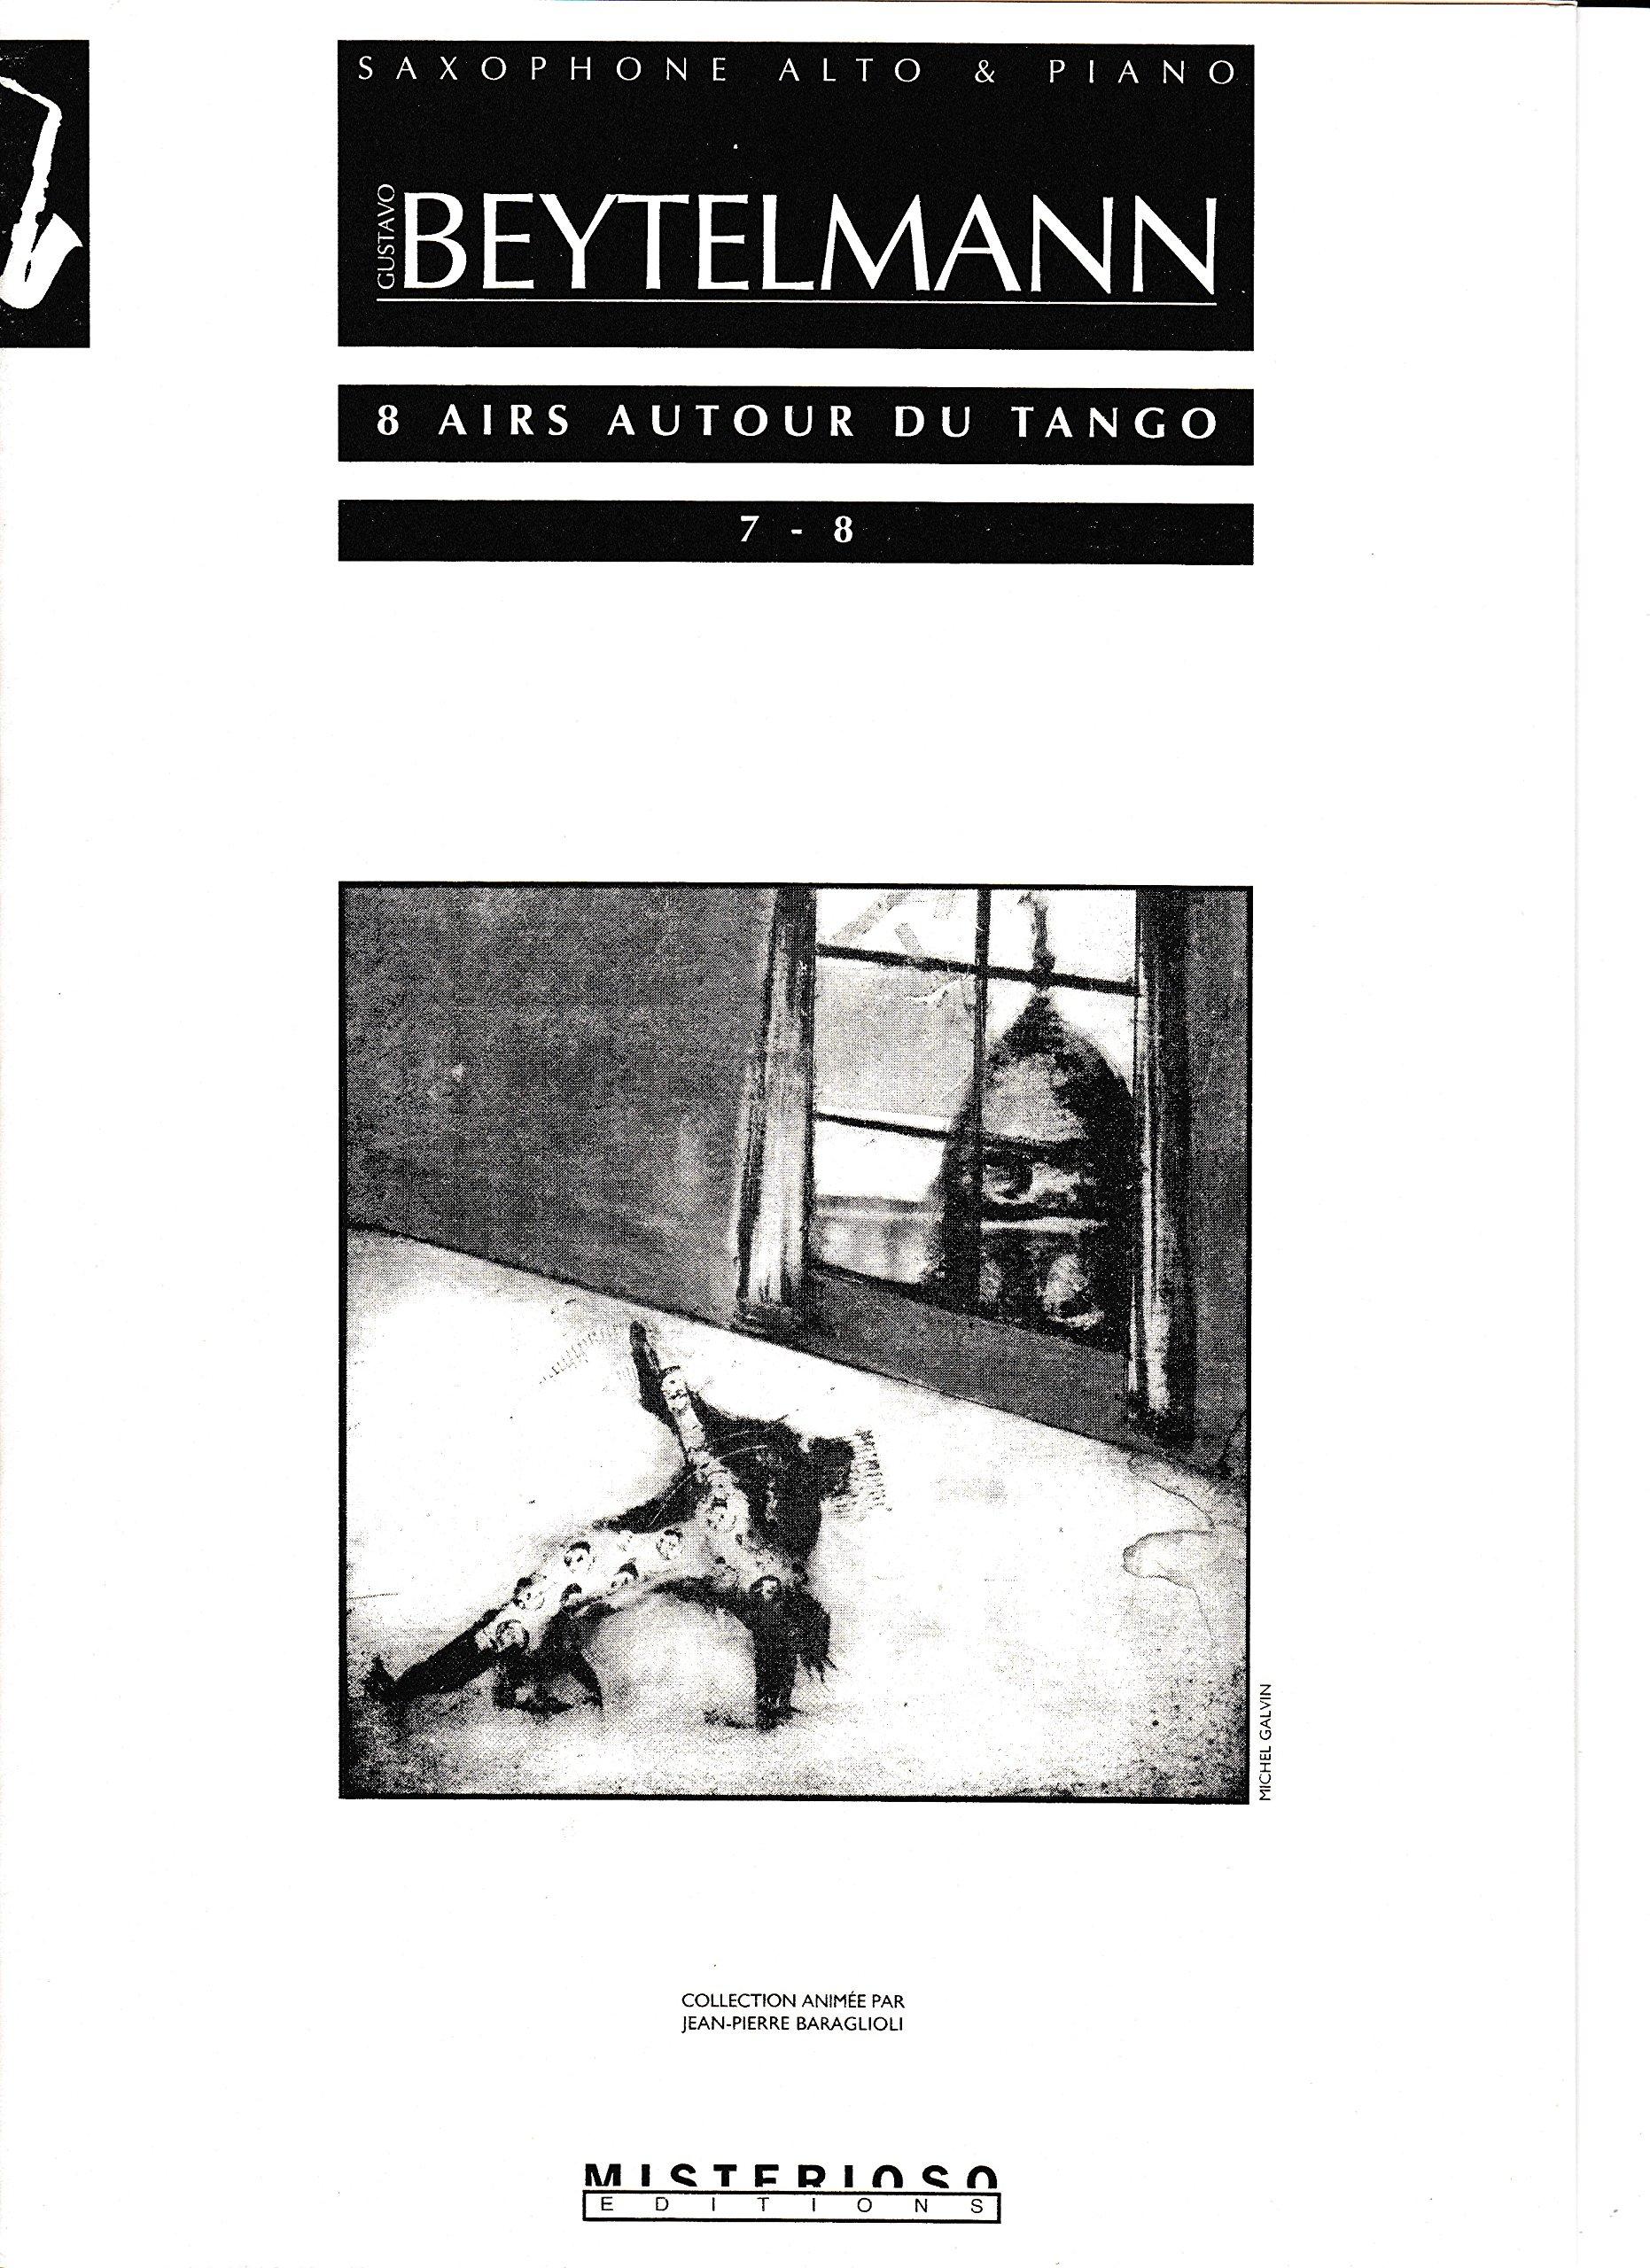 8 Airs Autour Du Tango Nos.7-8 for Alto Saxophone and Piano by Gustavo Beytelmann